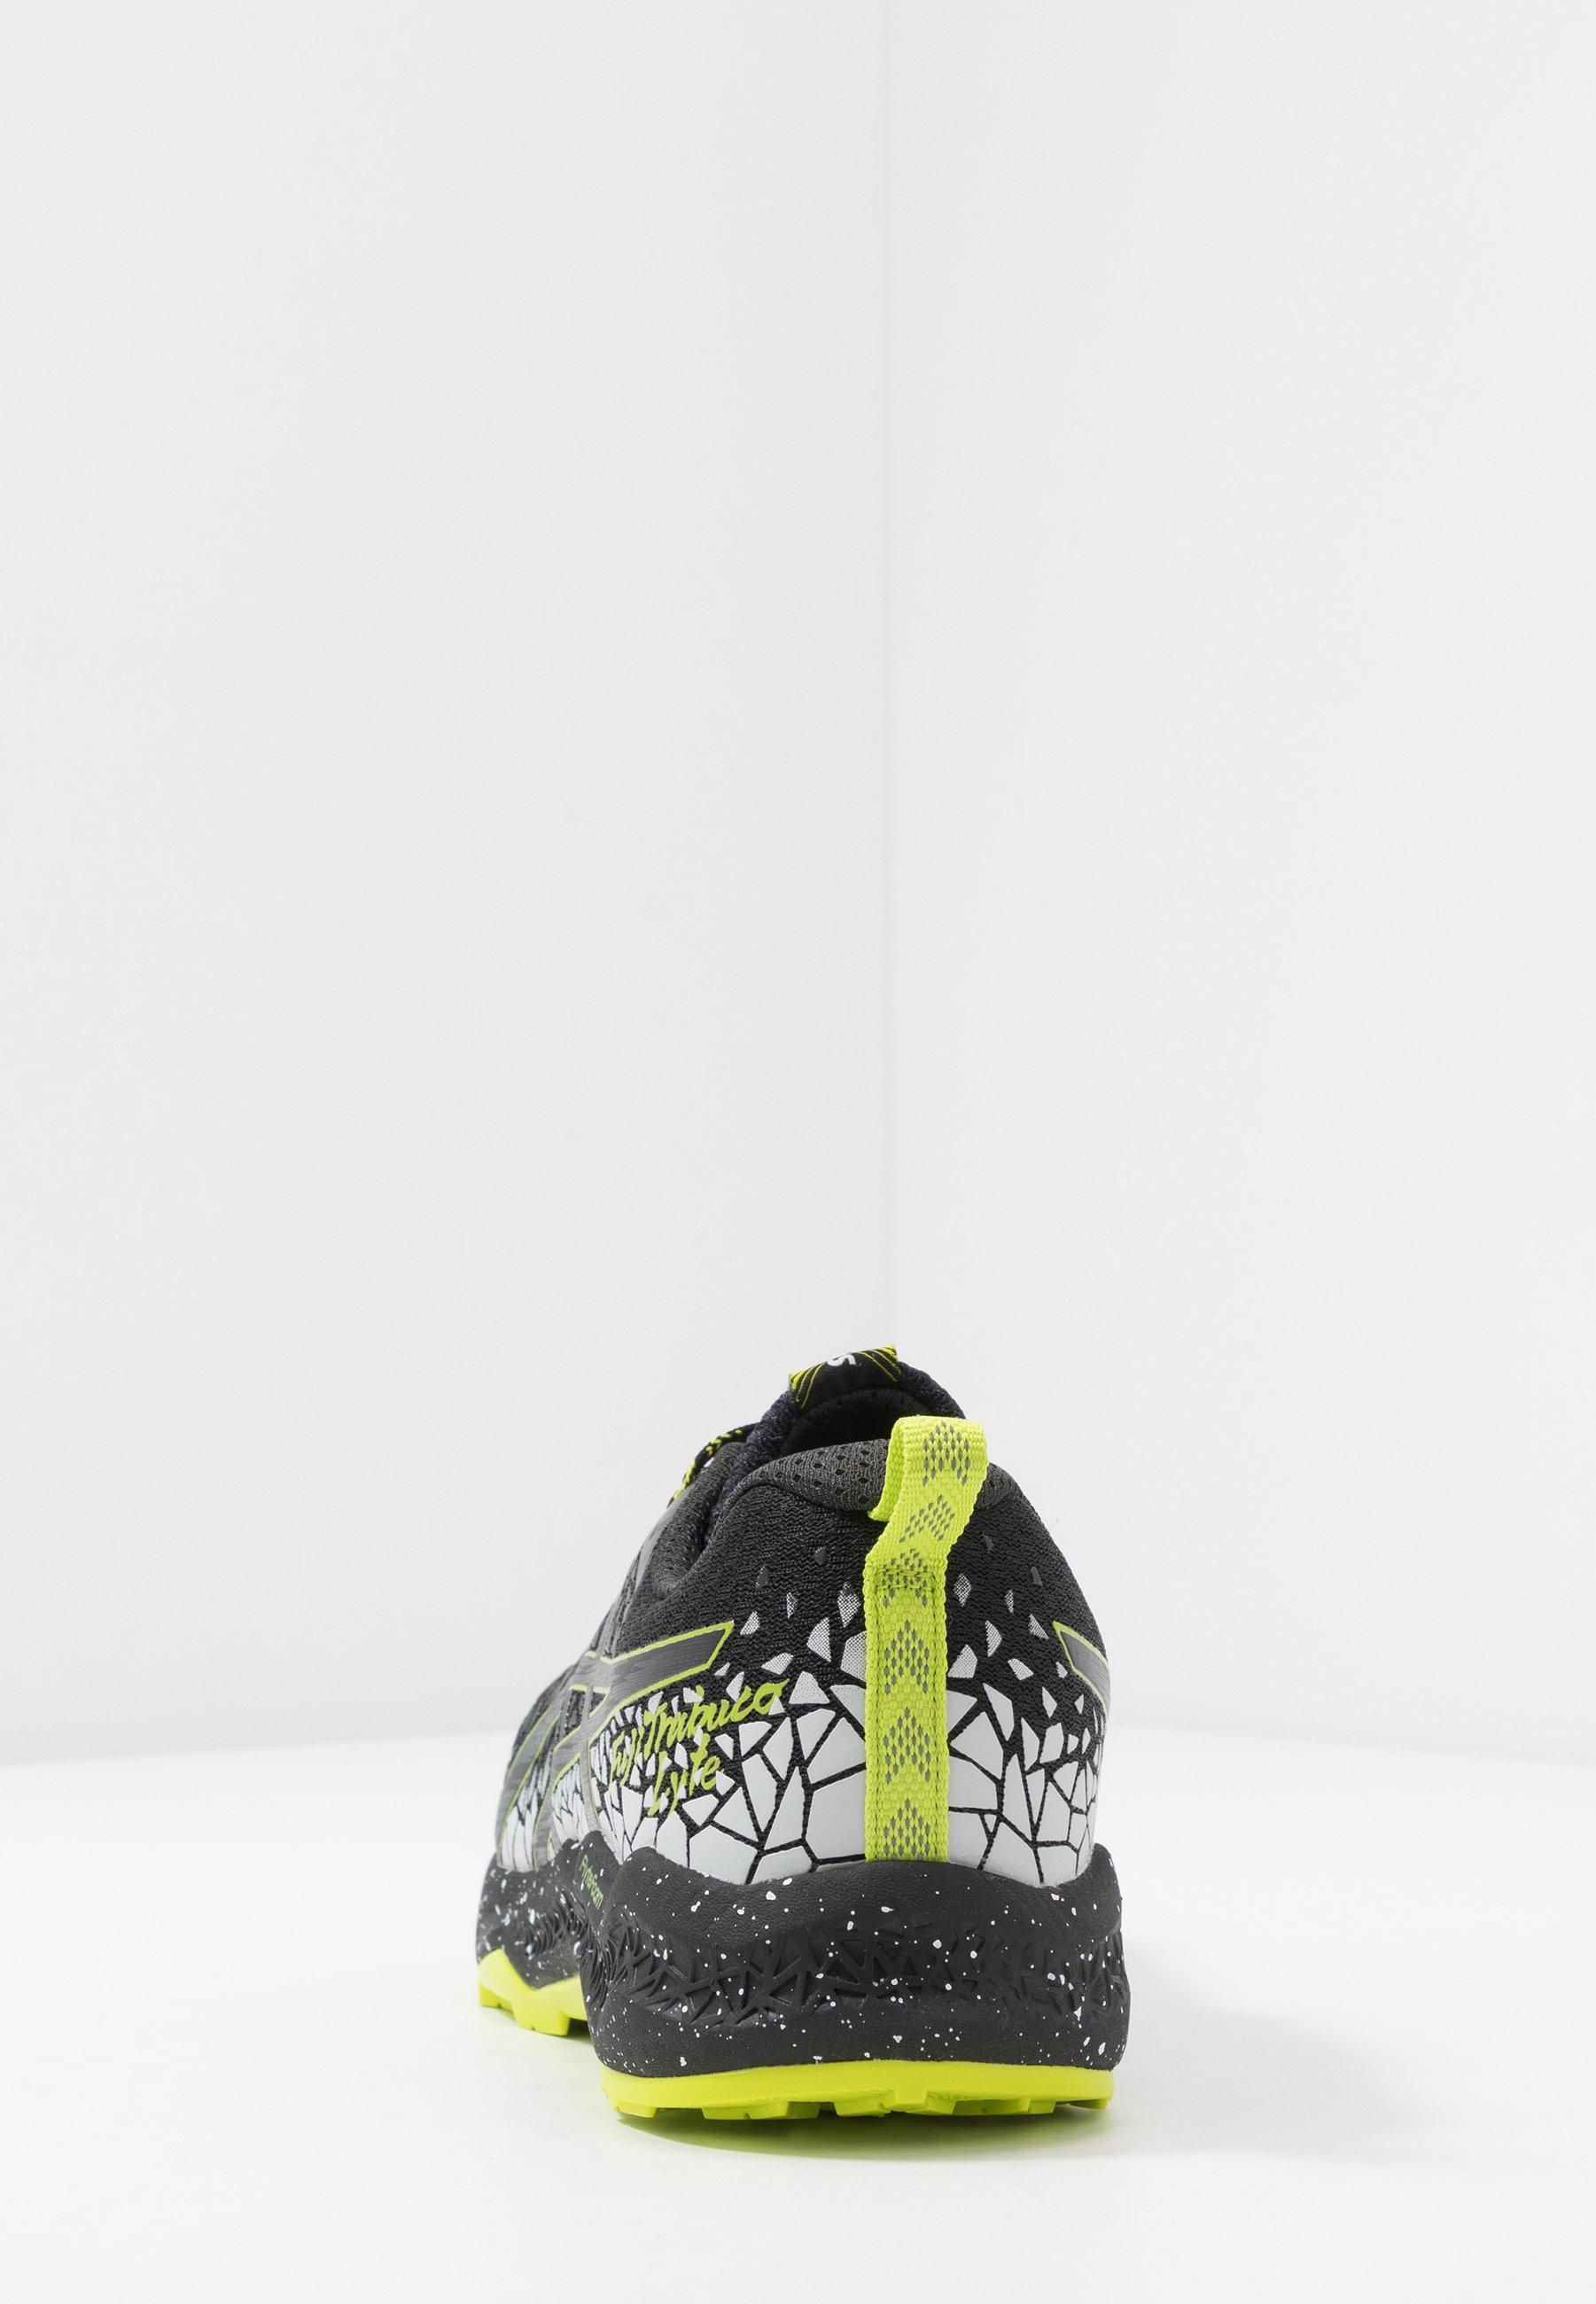 Asics Fujitrabuco Lyte - Trail Hardloopschoenen Black/graphite Grey Goedkope Schoenen